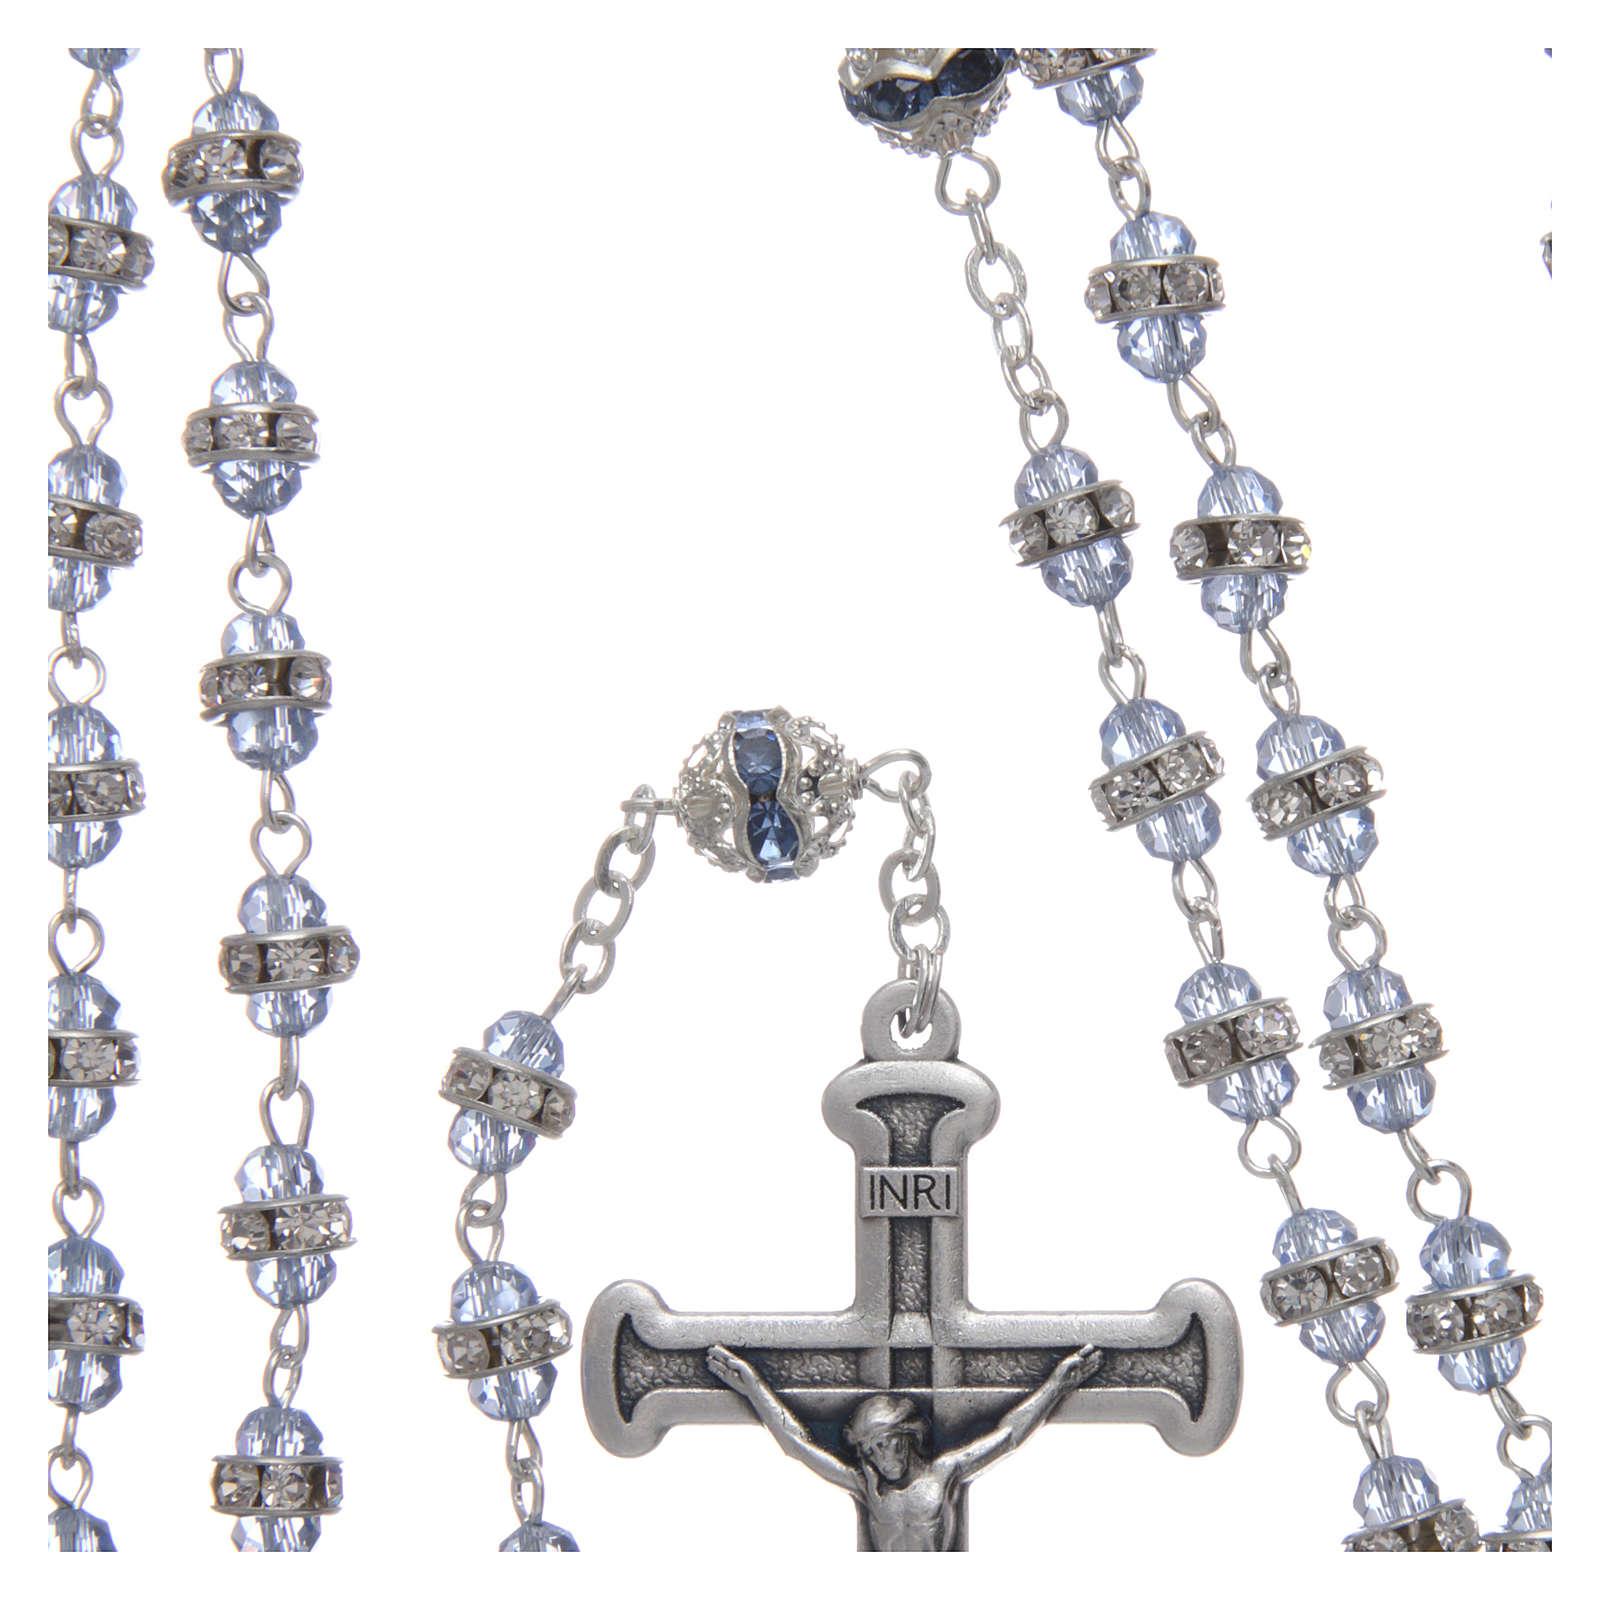 Chapelet saphir en strass et métal oxydé 4